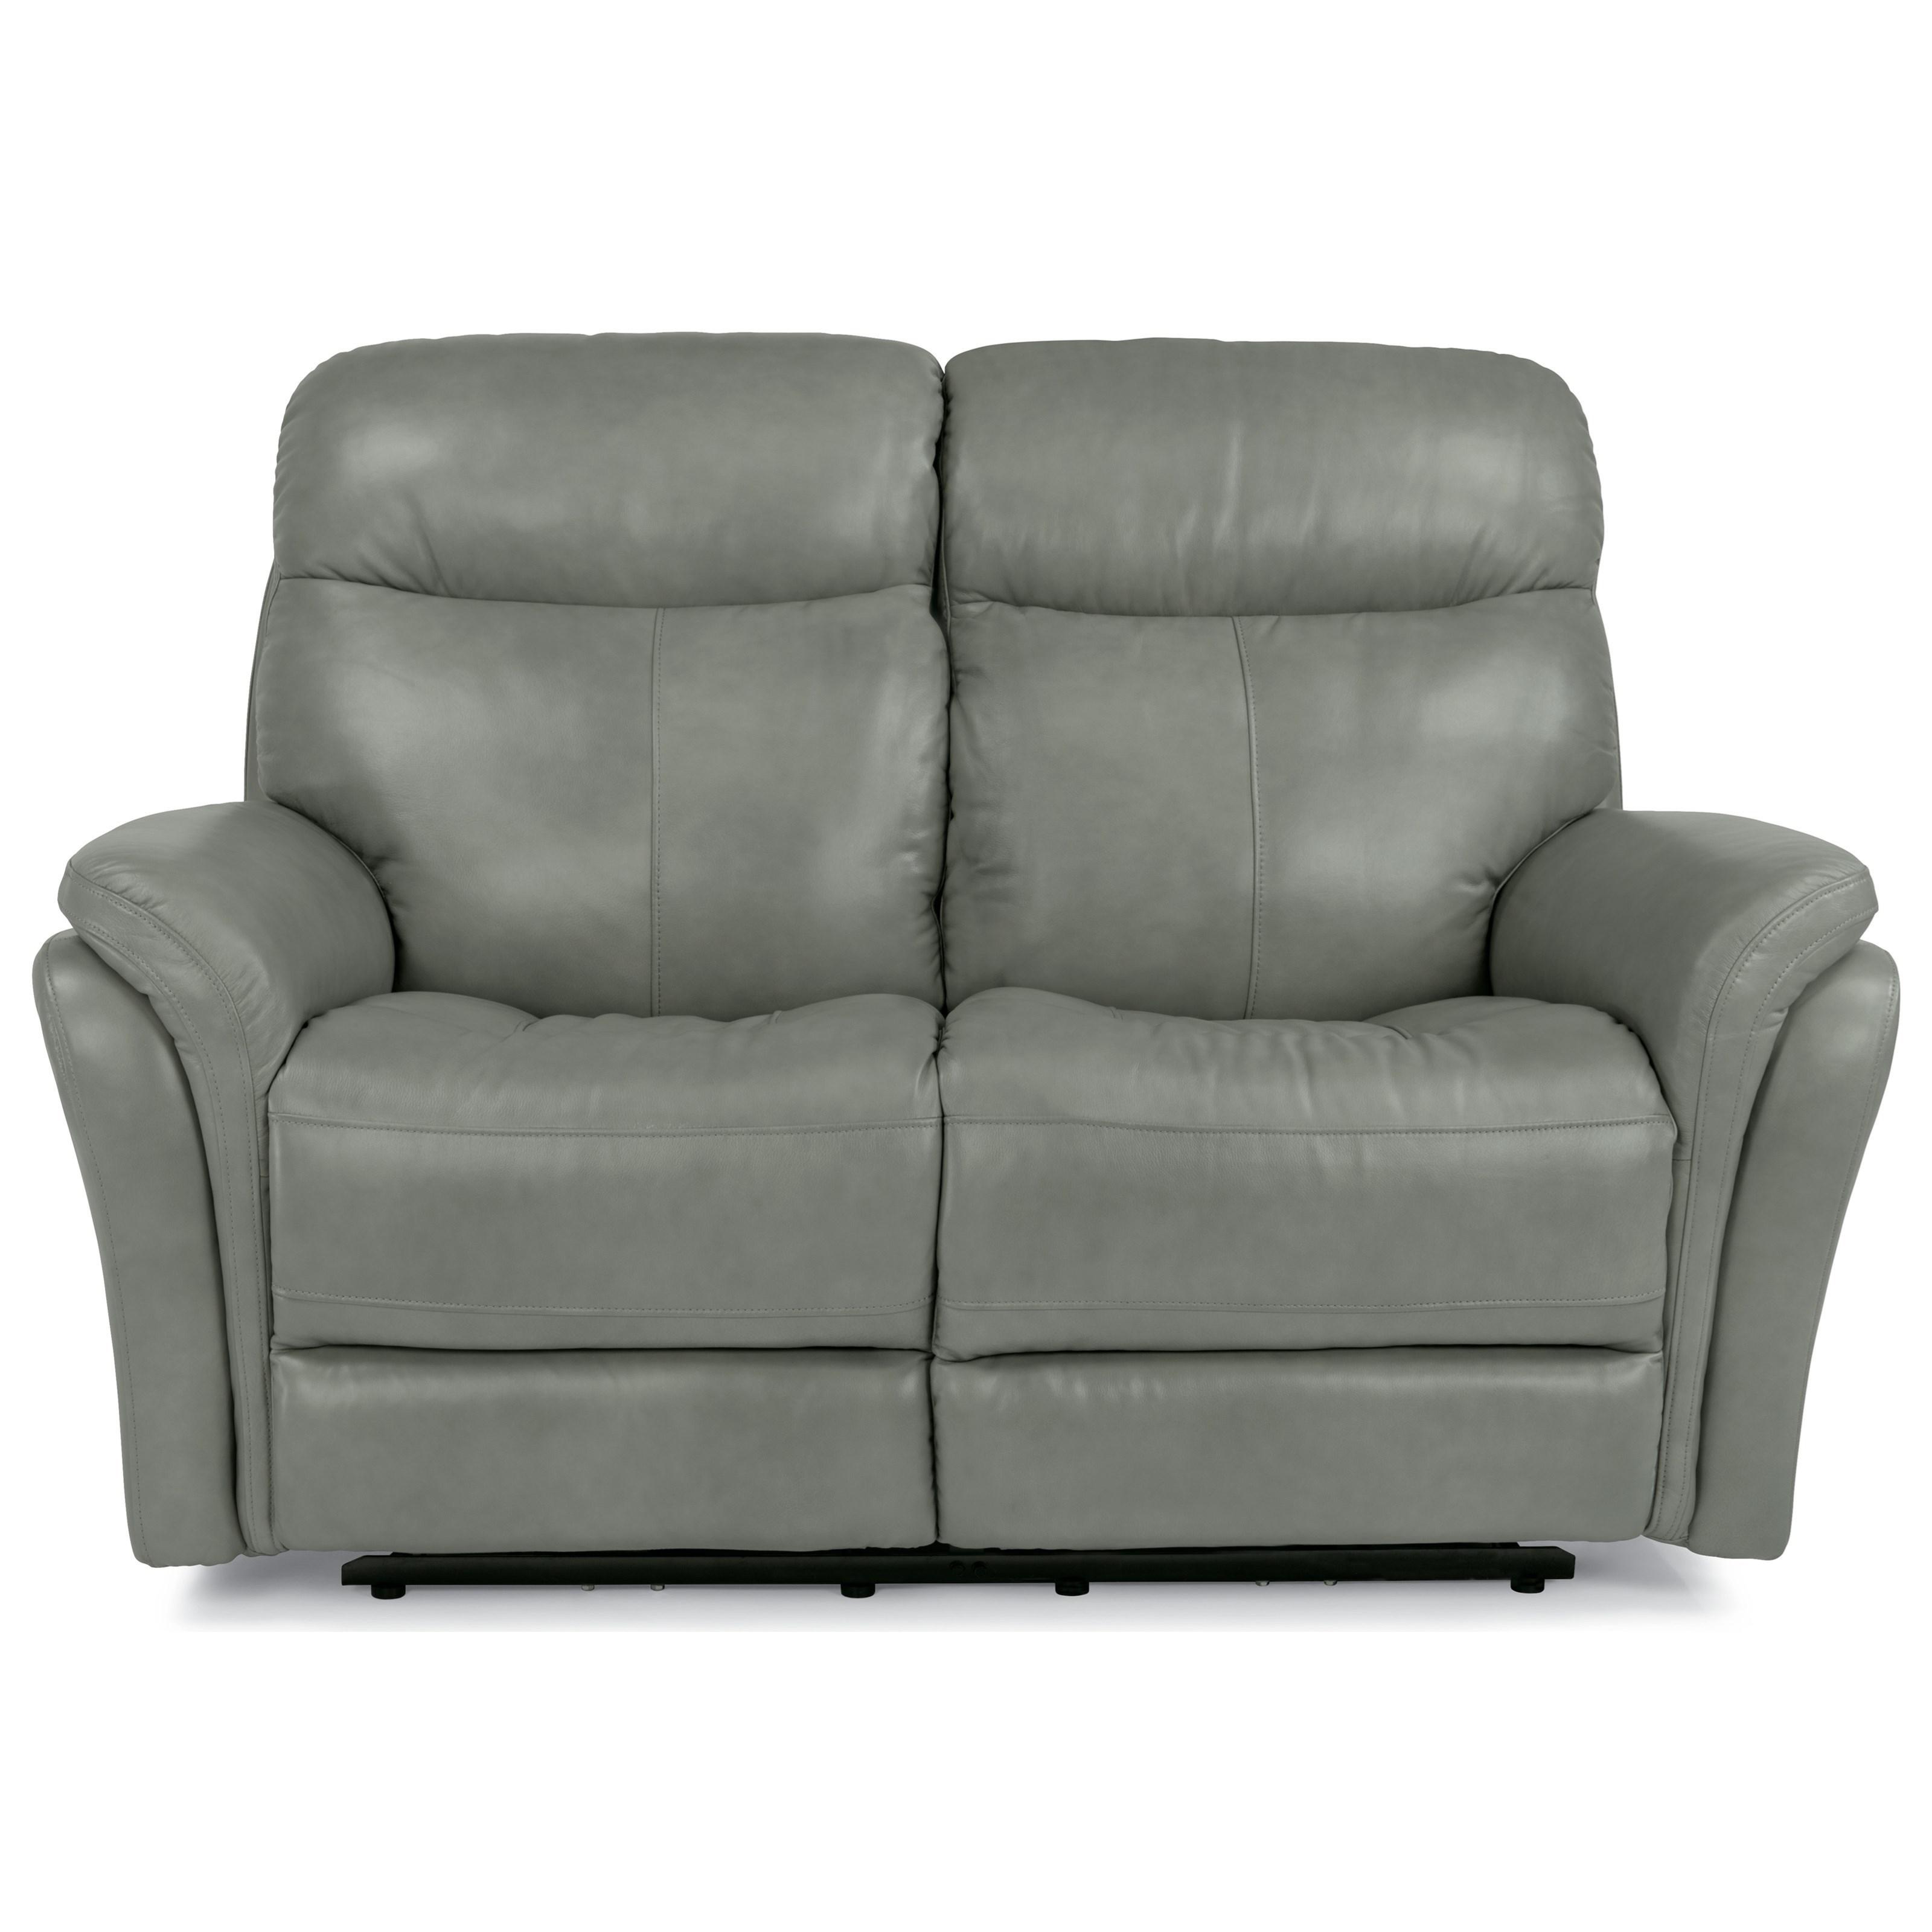 Latitudes-Zoey Power Reclining Love Seat w/ Power Headrest by Flexsteel at Northeast Factory Direct